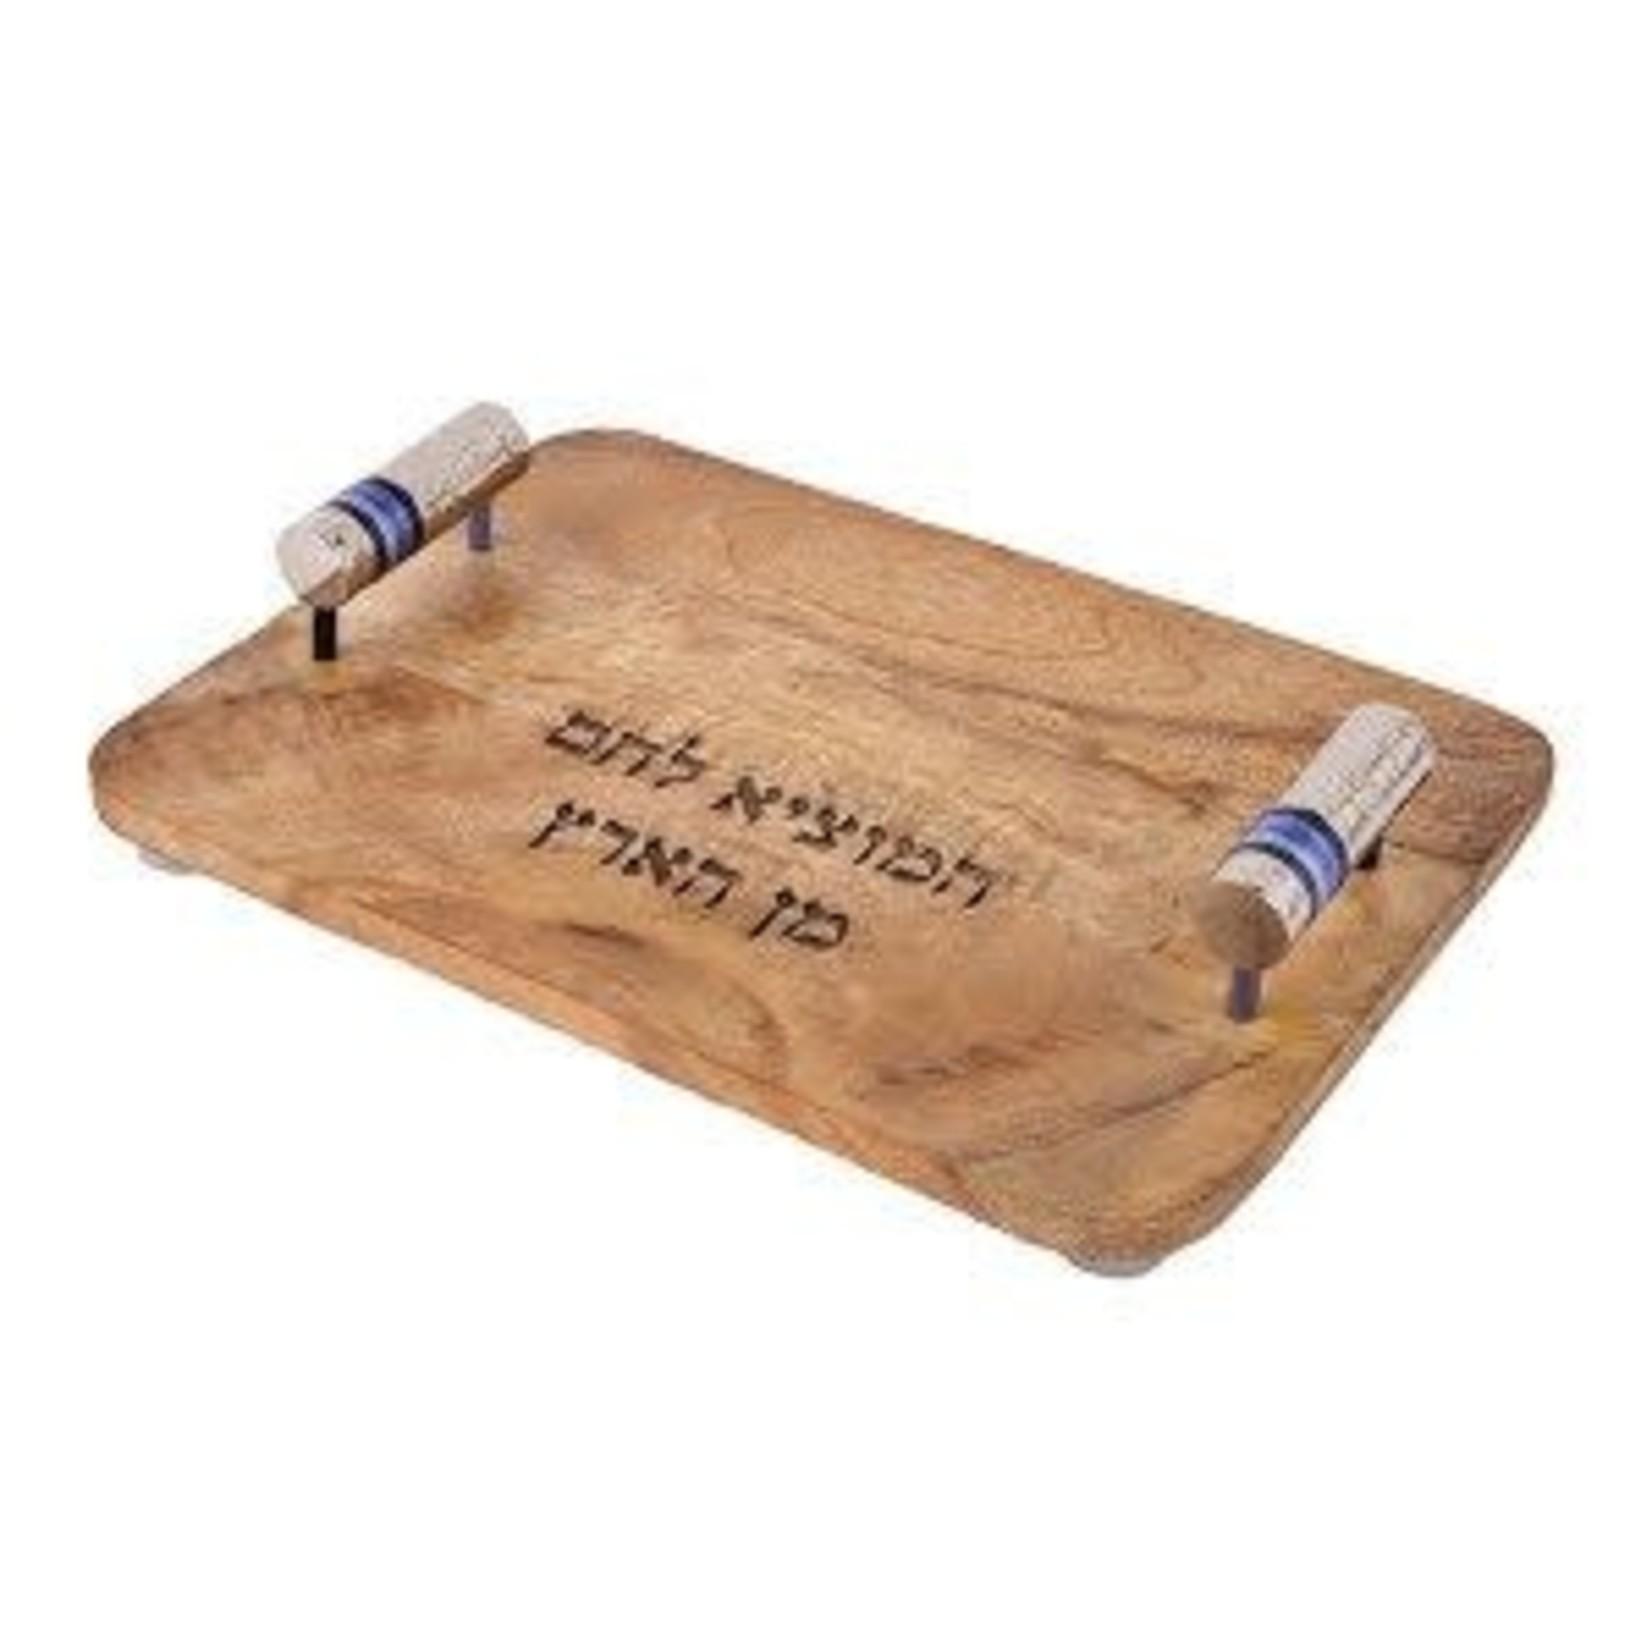 Yair Emanuel Challah Board, Wood with Aluminum Handles